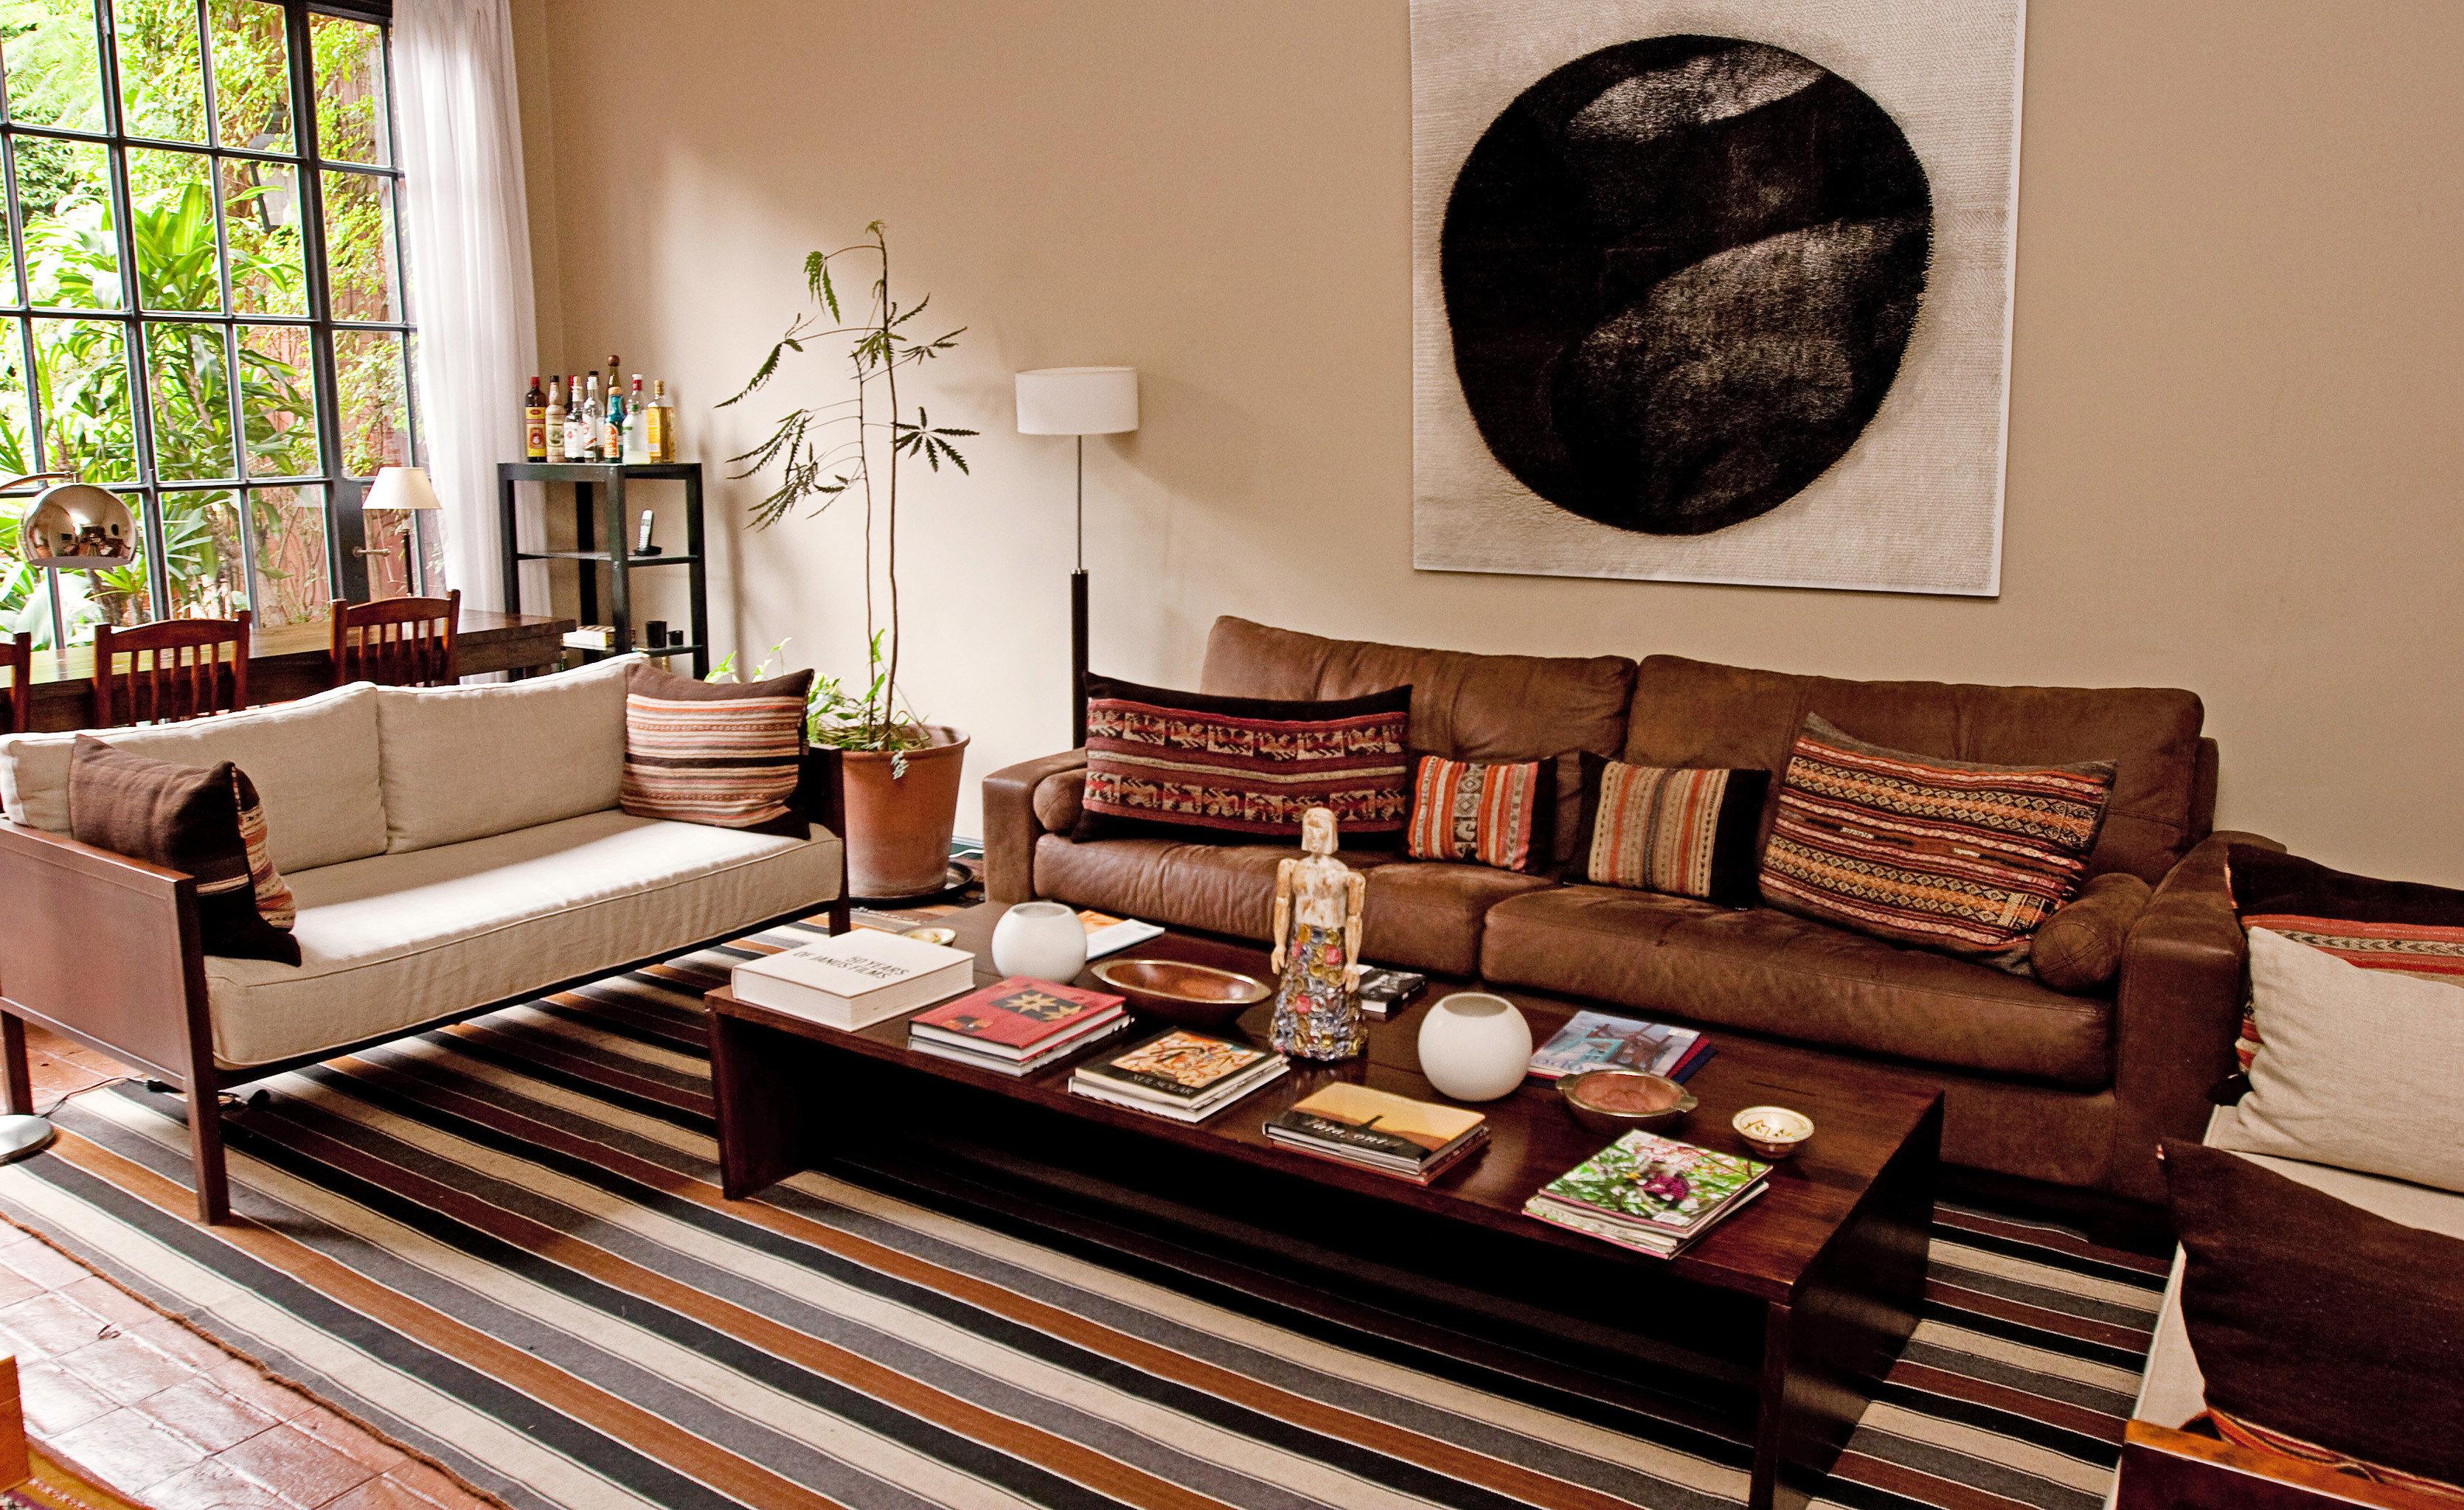 Bedroom Classic Suite living room property home hardwood